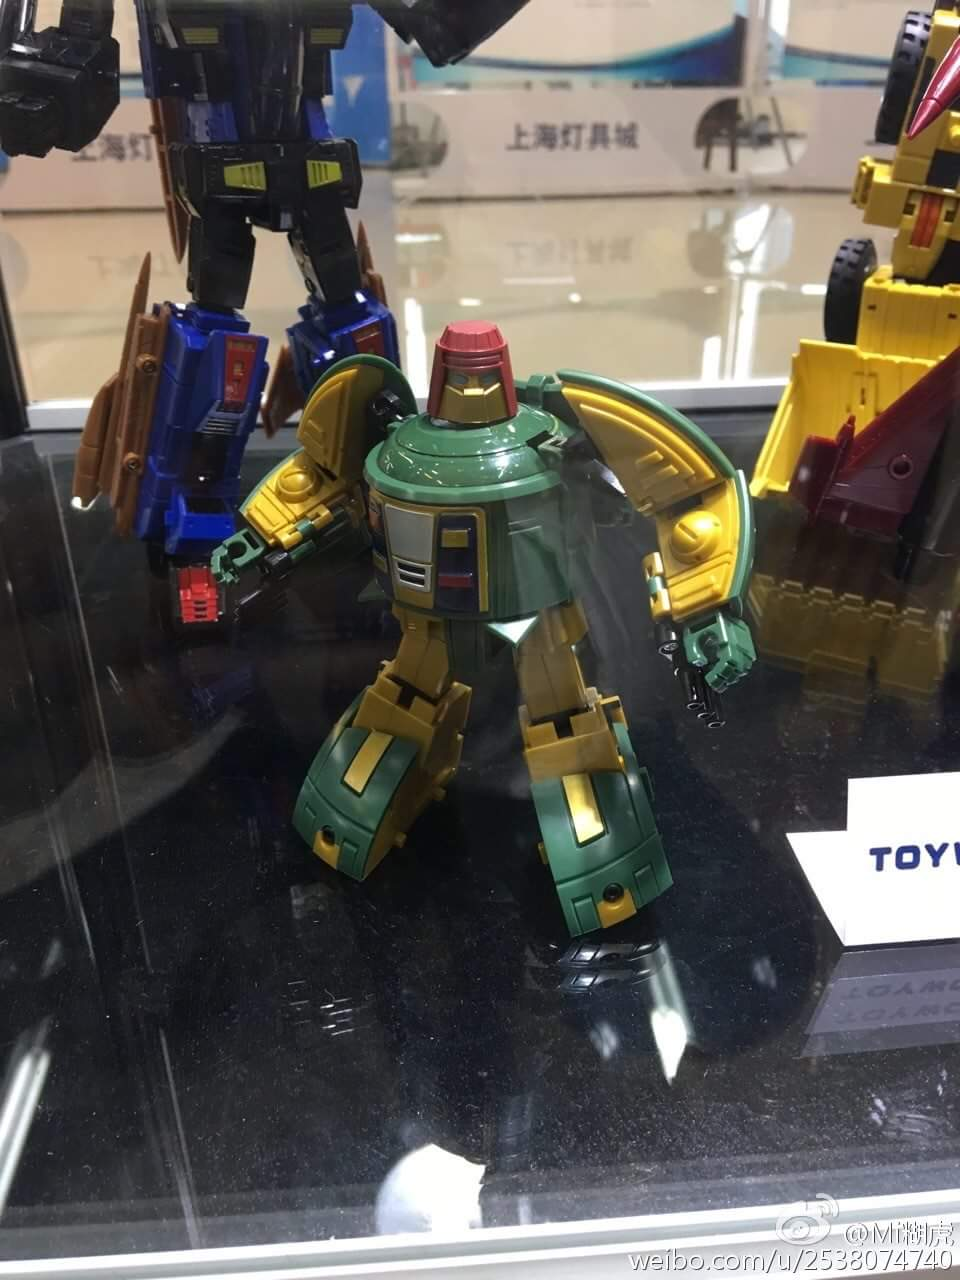 [Toyworld][Zeta Toys] Produit Tiers - Minibots MP - Gamme EX - Page 2 CKYFAO4F